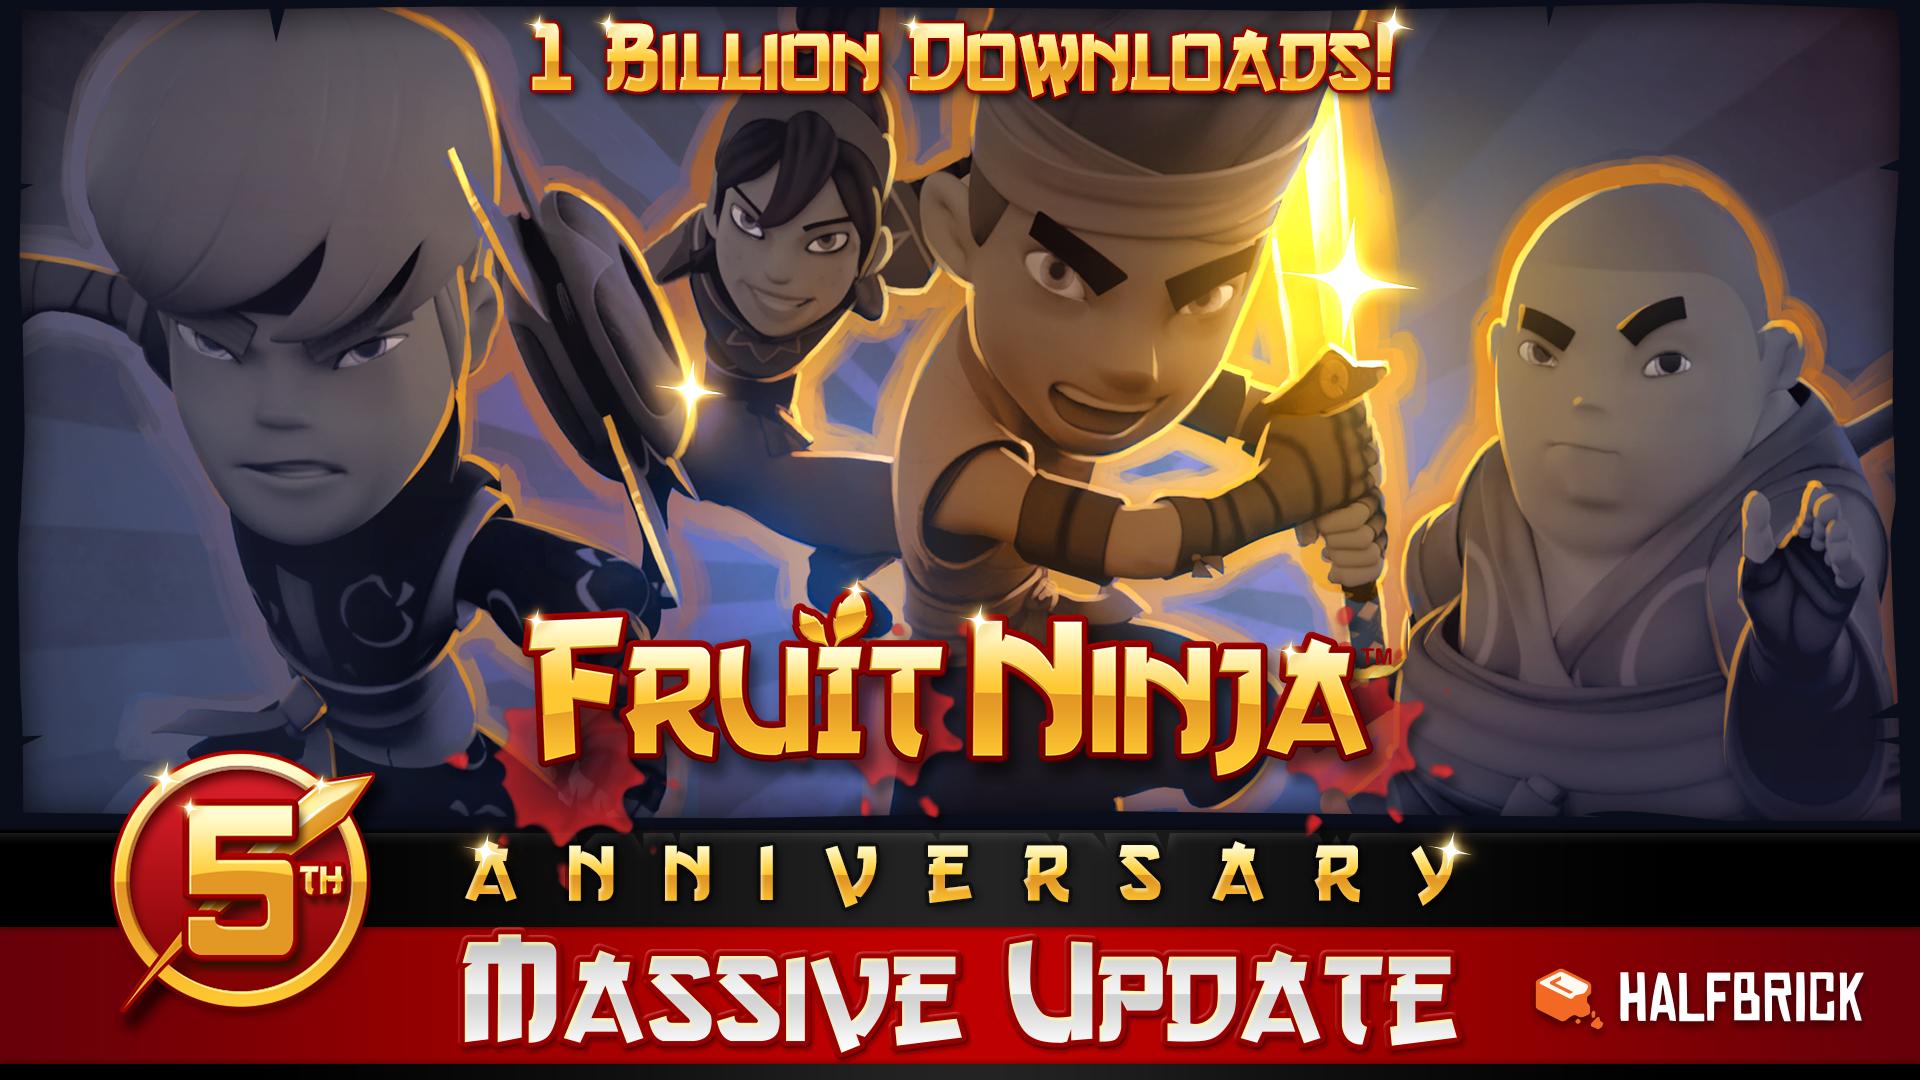 Fruit ninja free game - Watch Video